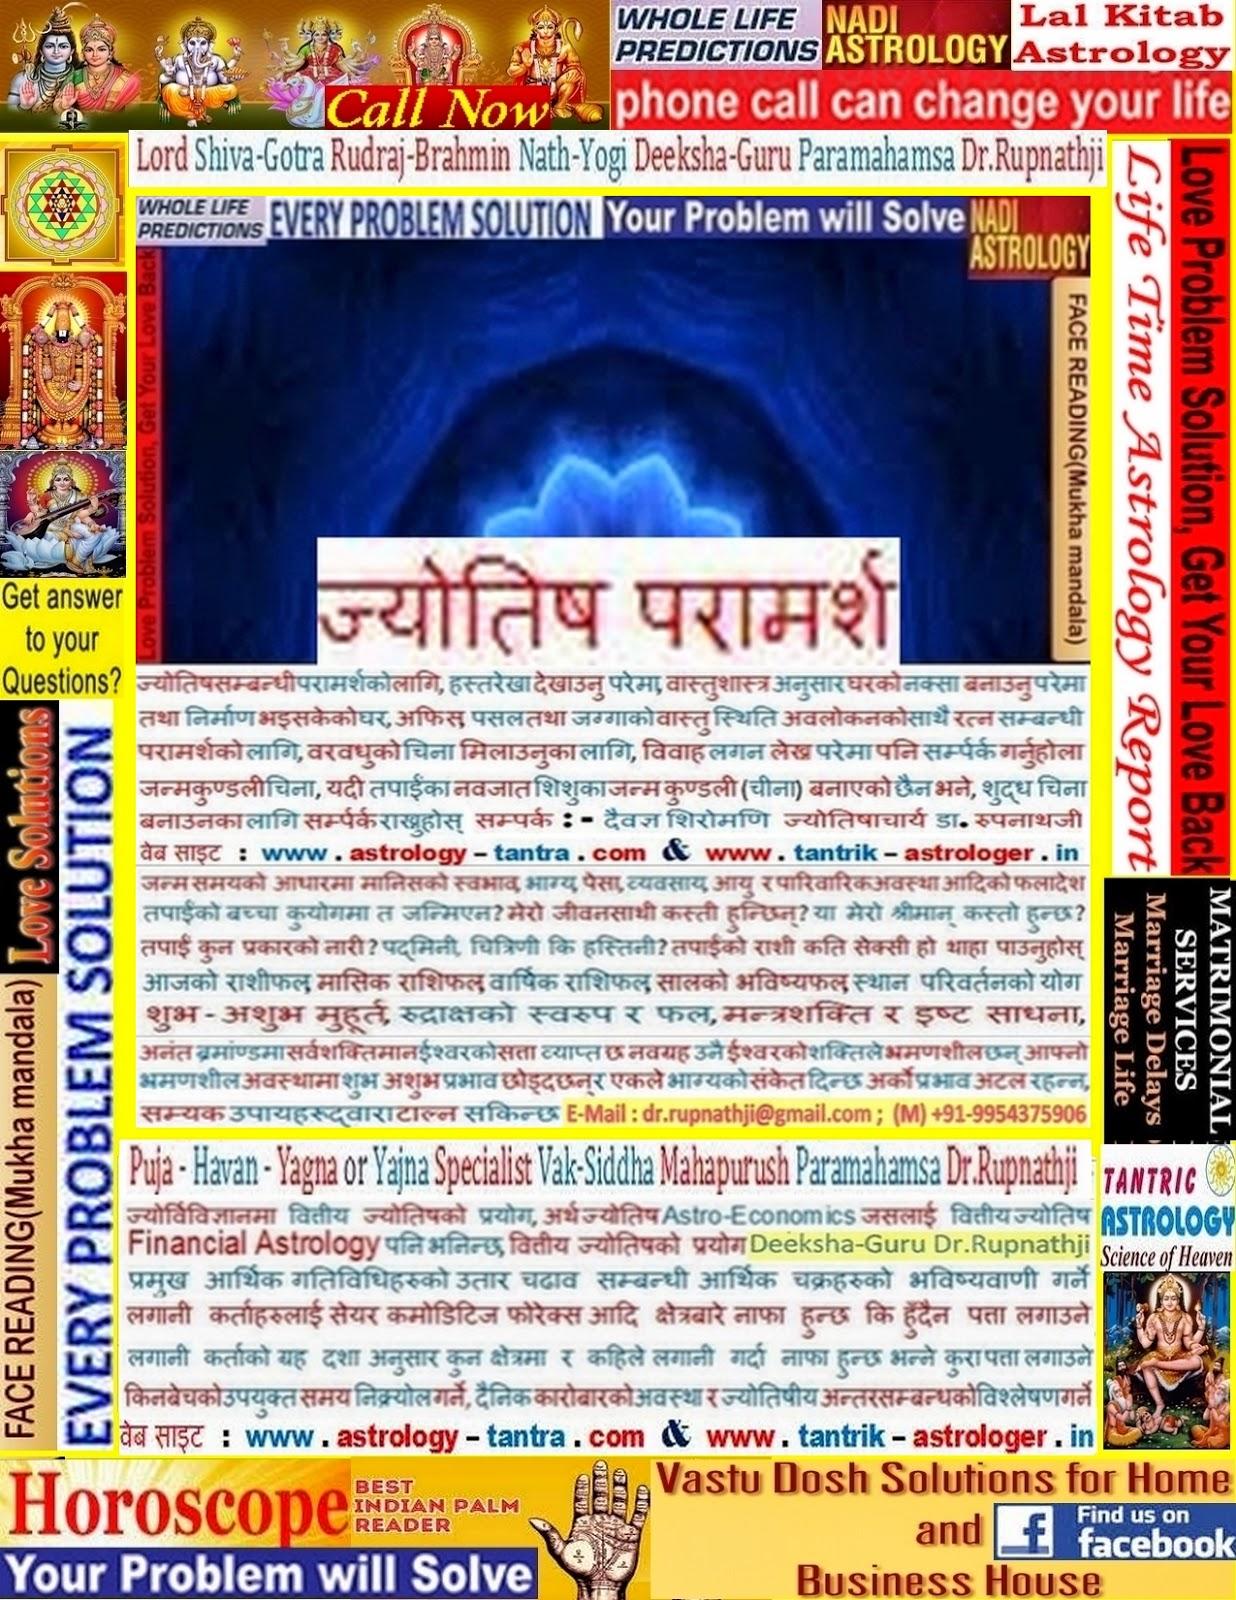 free lal kitab matchmaking in hindi